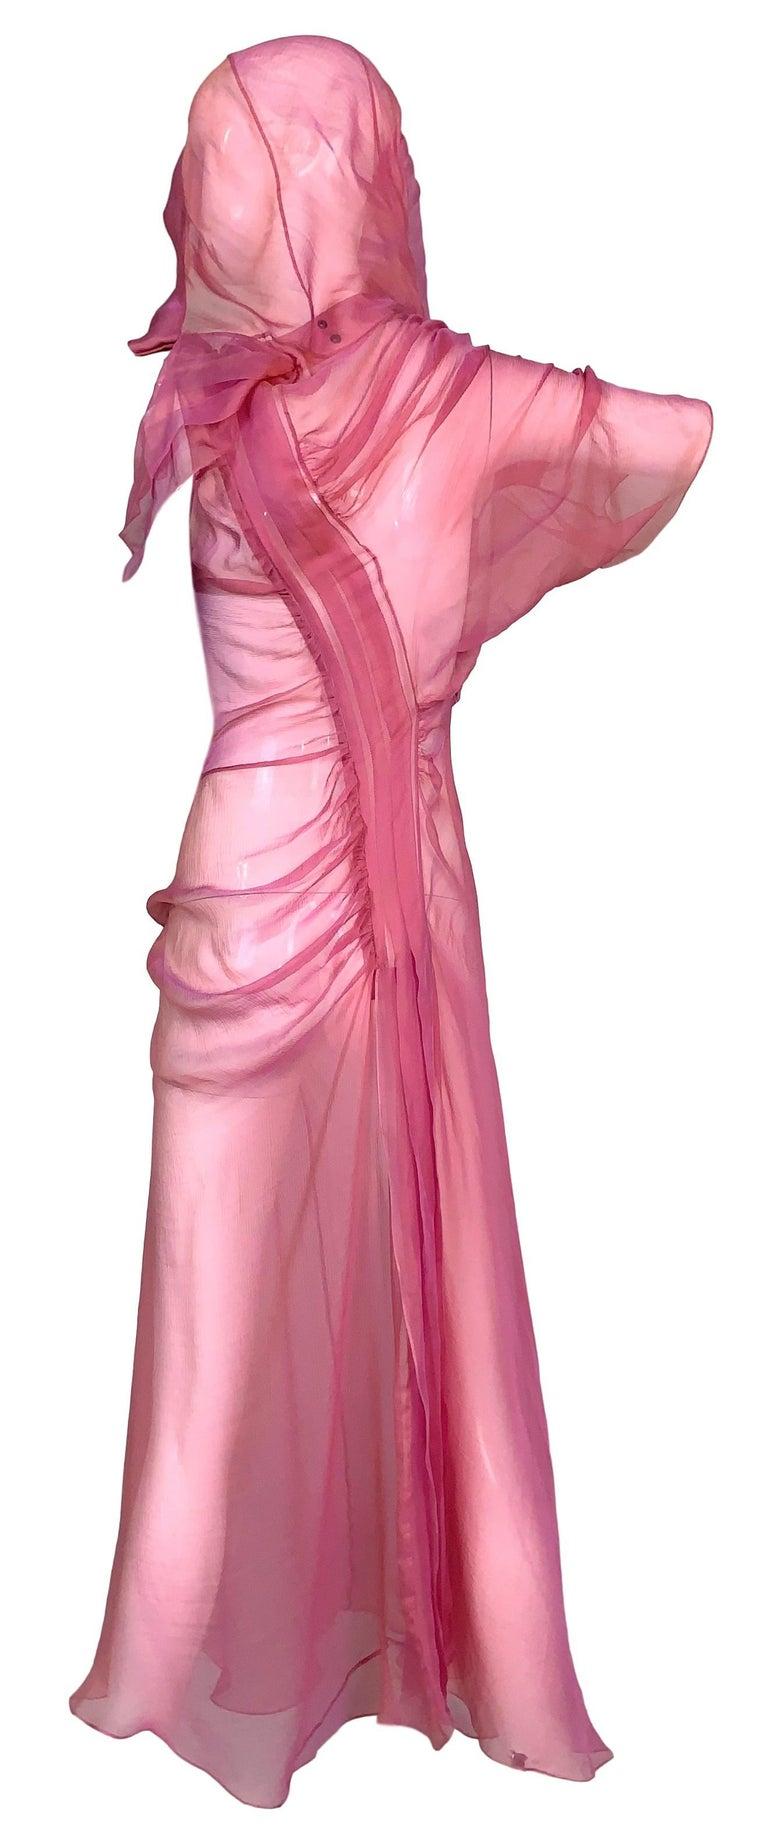 Women's S/S 2002 Christian Dior John Galliano Runway Sheer Pink Hooded 2 Dresses